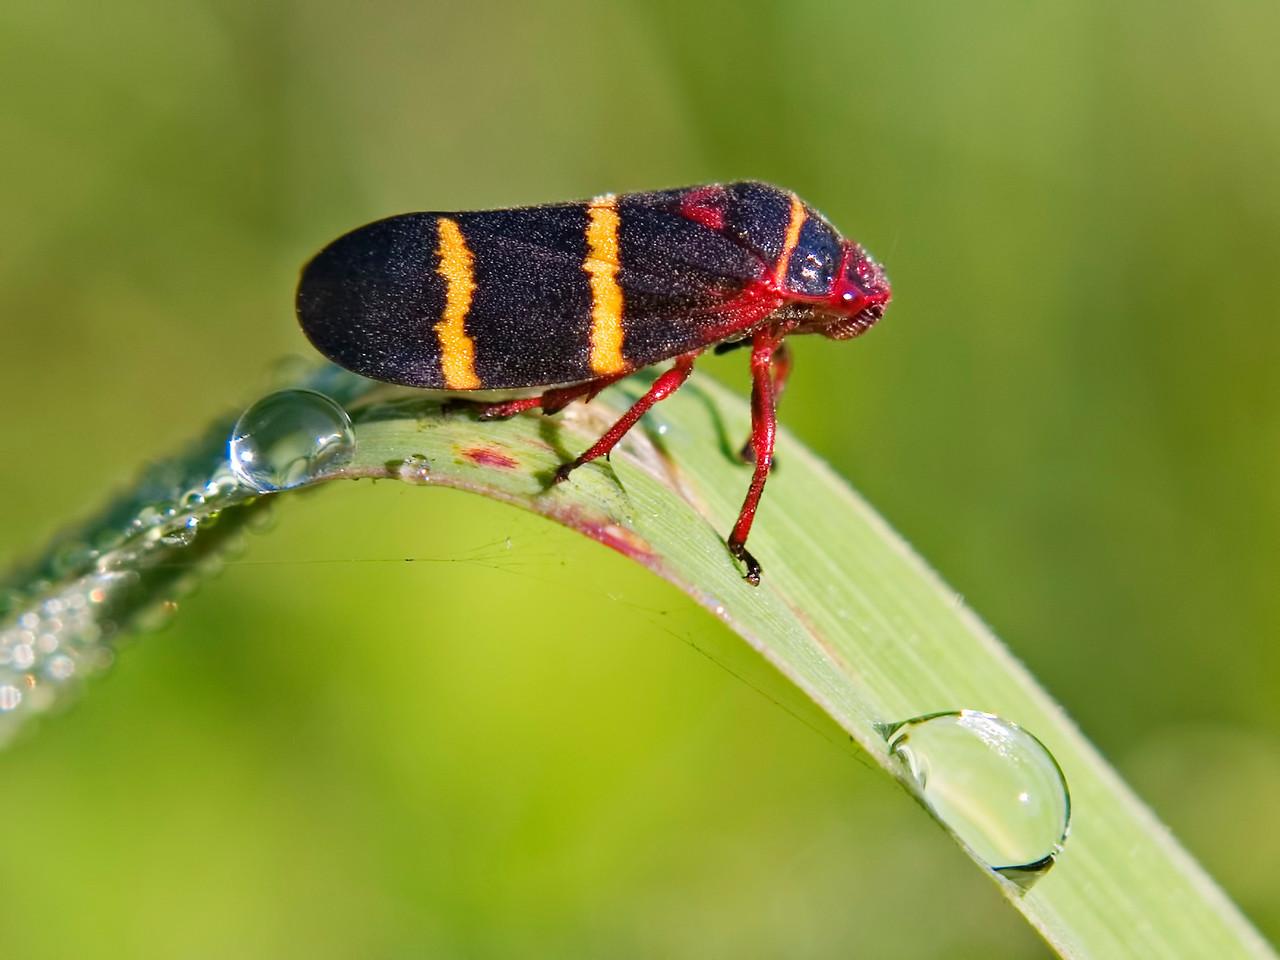 July 19 - Leaf Hopper